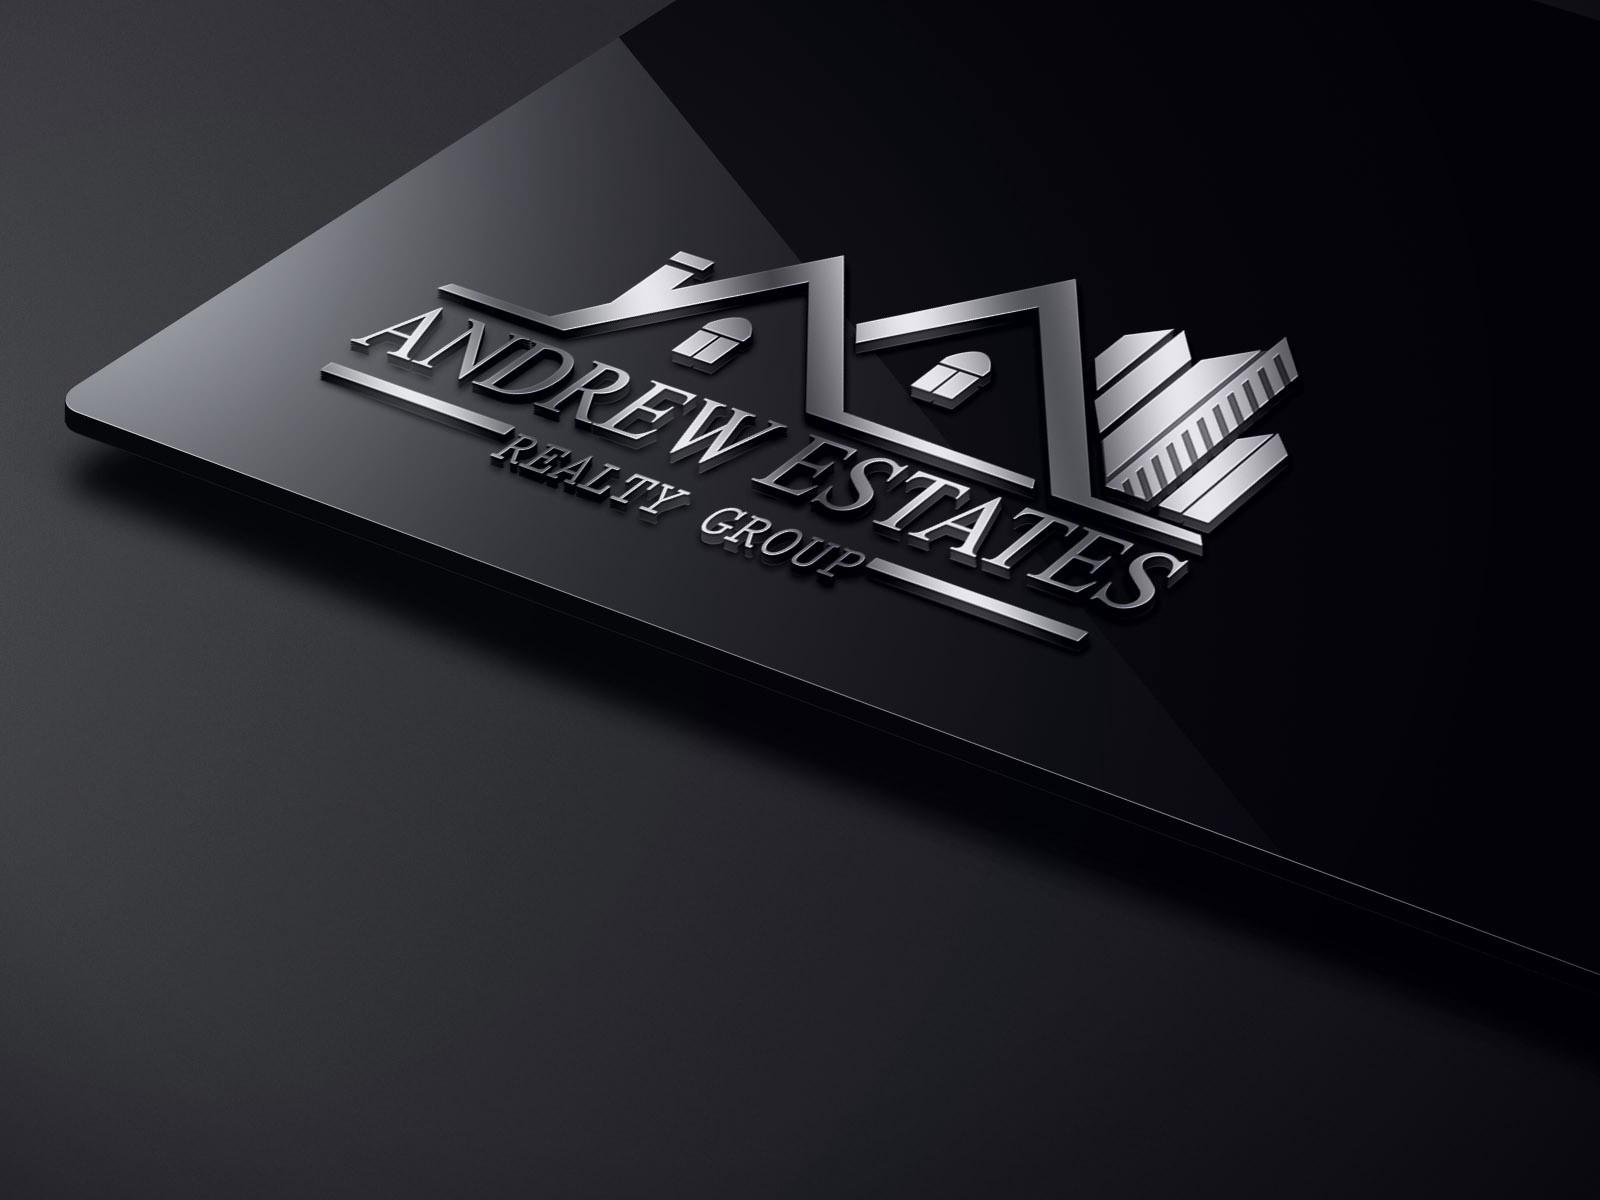 I will create 3 modern & luxury logo